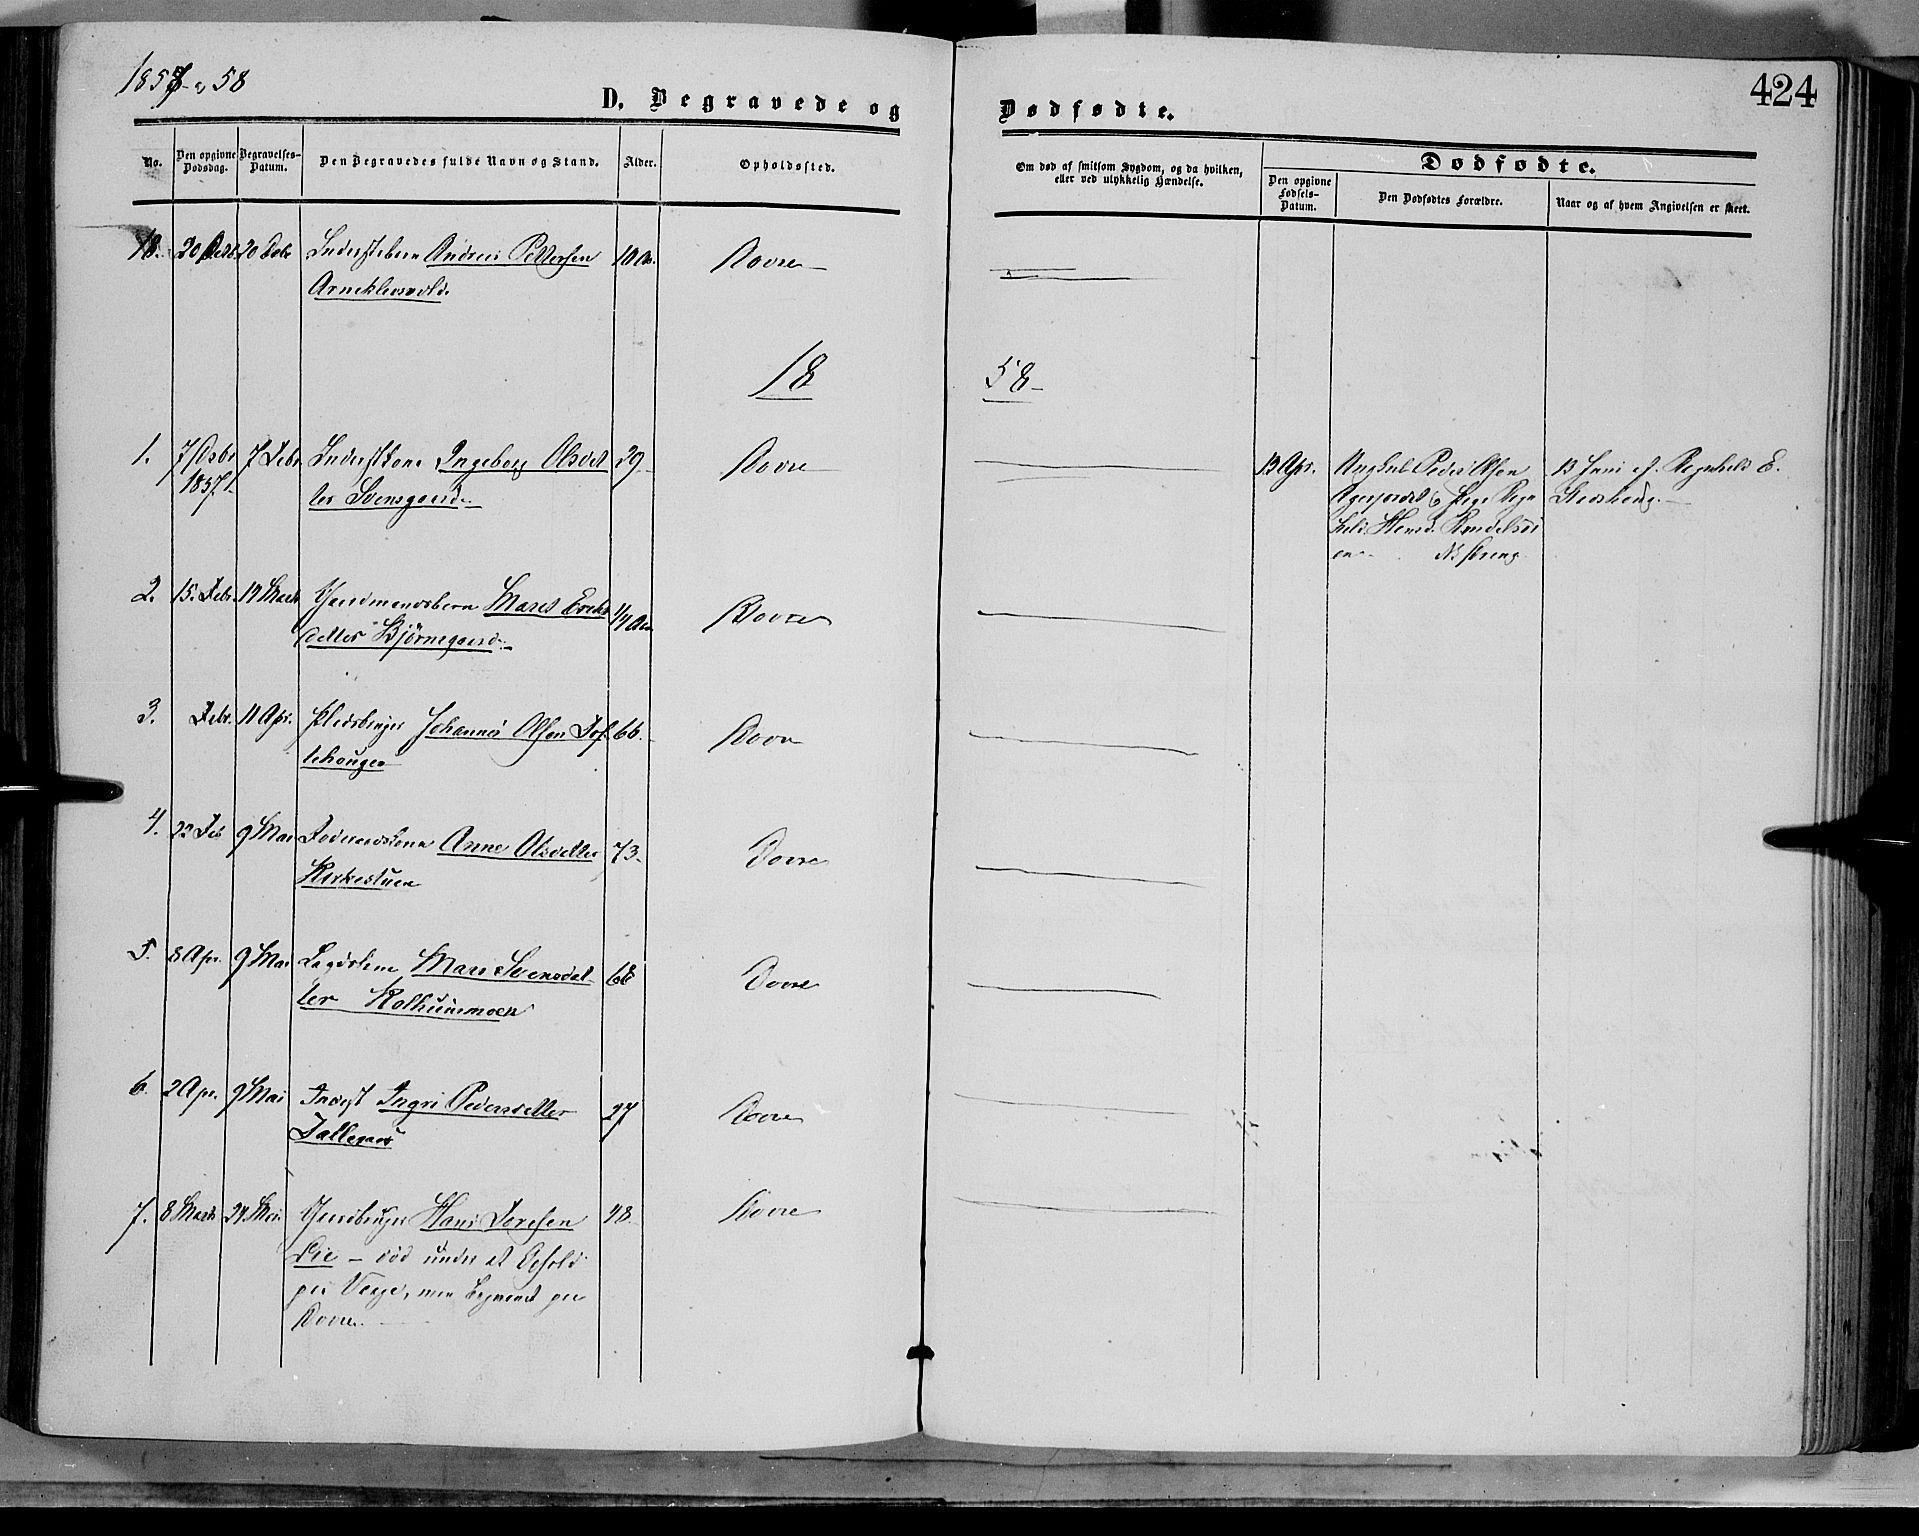 SAH, Dovre prestekontor, Ministerialbok nr. 1, 1854-1878, s. 424